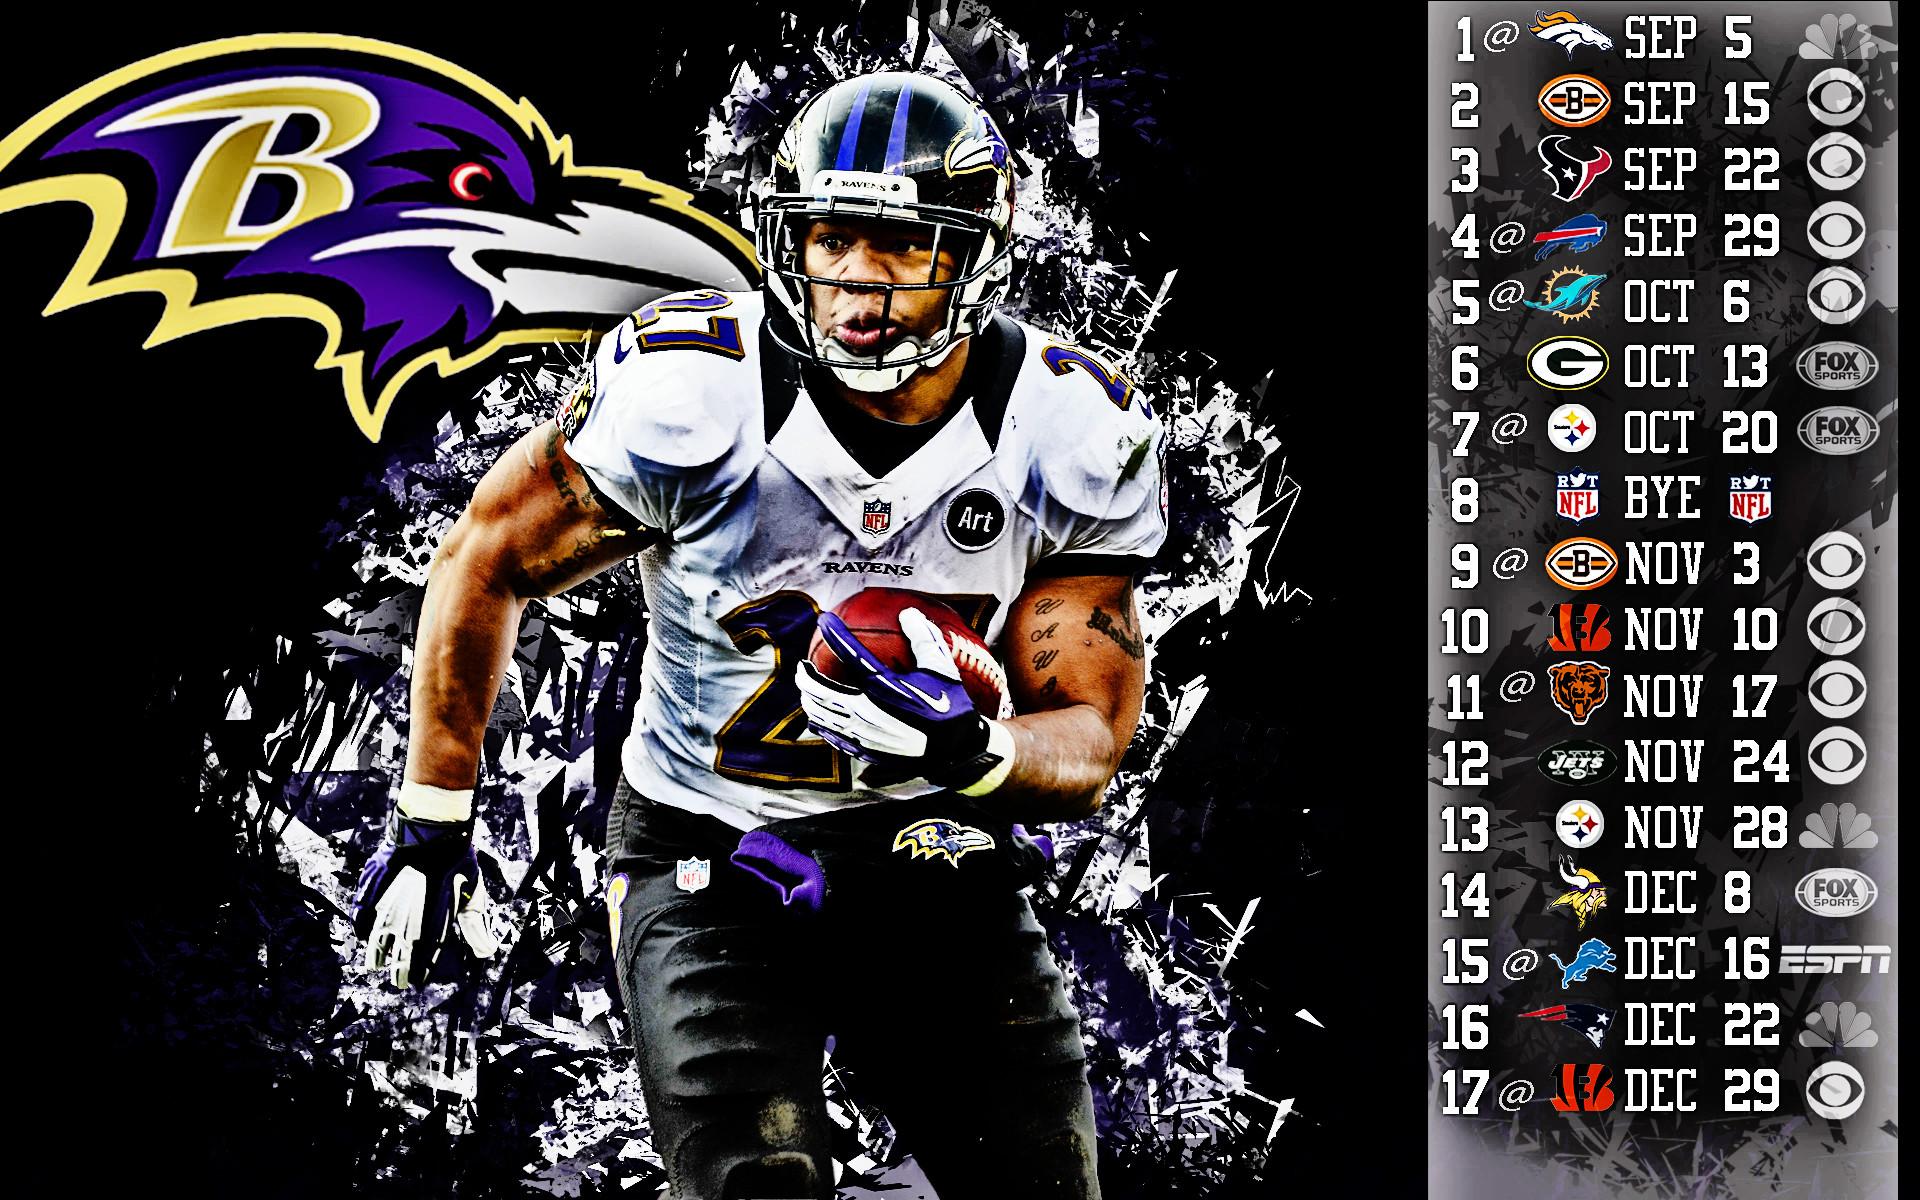 2013 Baltimore Ravens football nfl wallpaper | | 130396 |  WallpaperUP